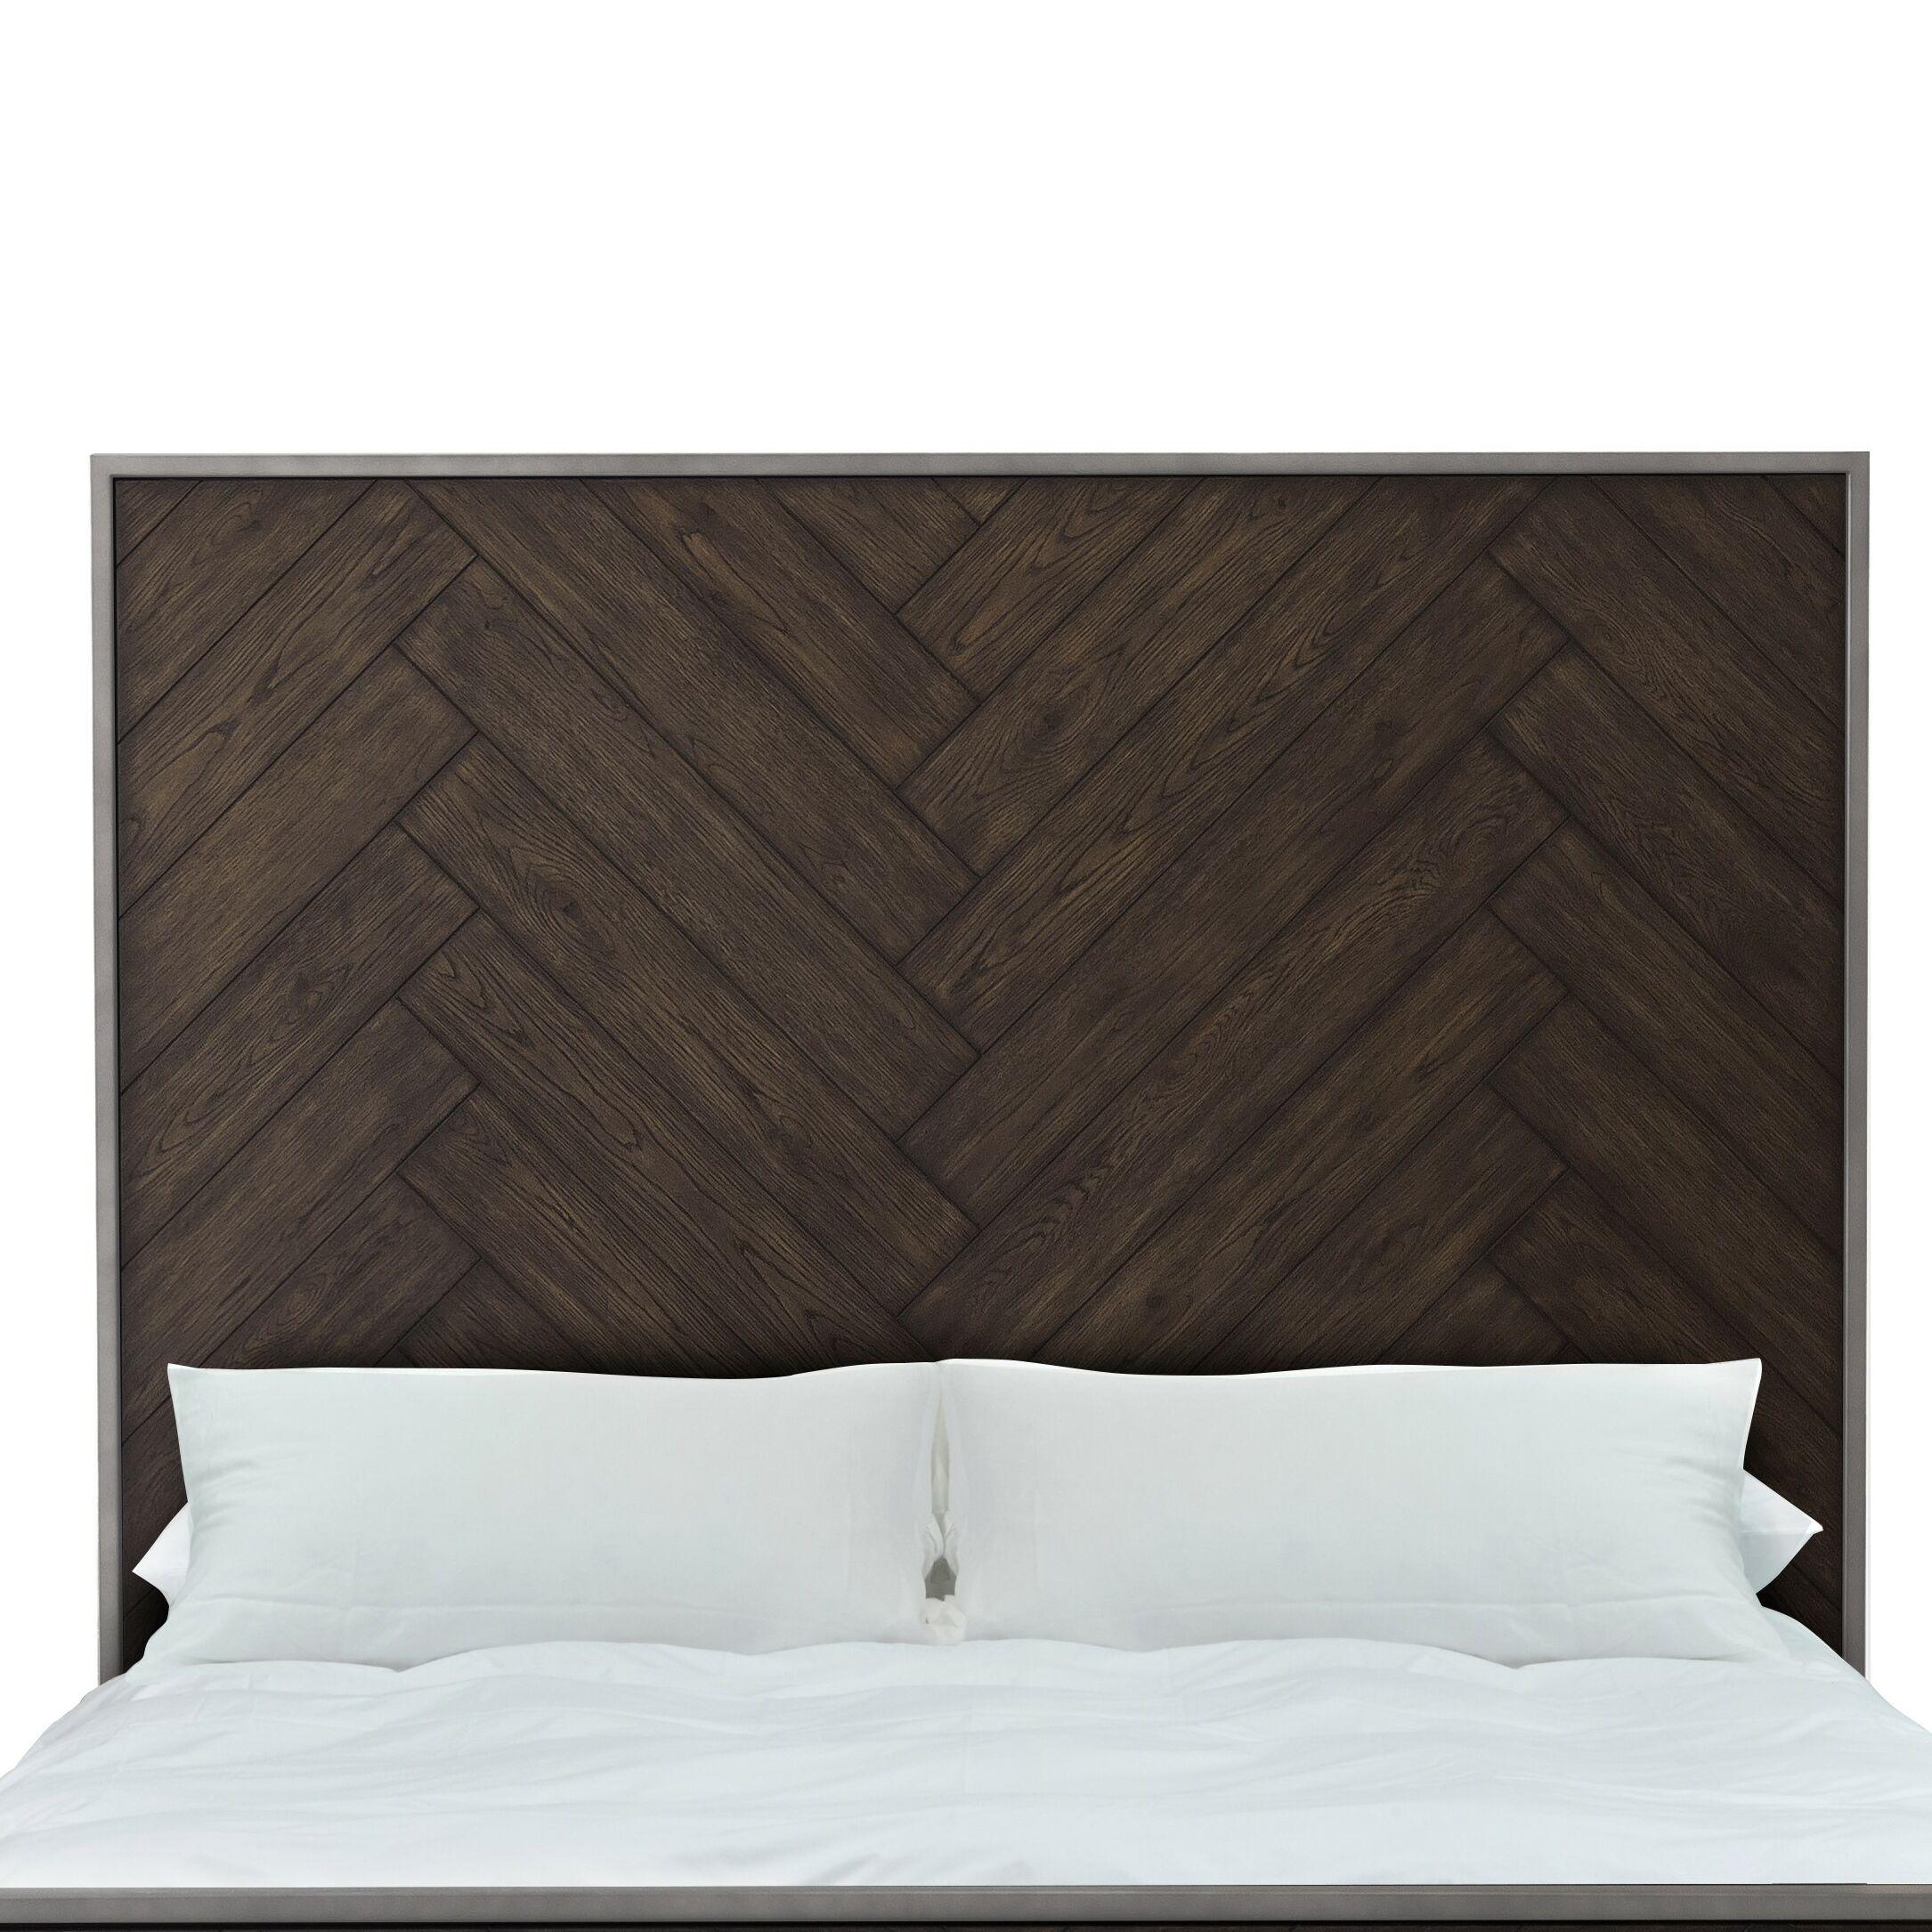 Aahil Panel Headboard Color: Brown, Size: Queen